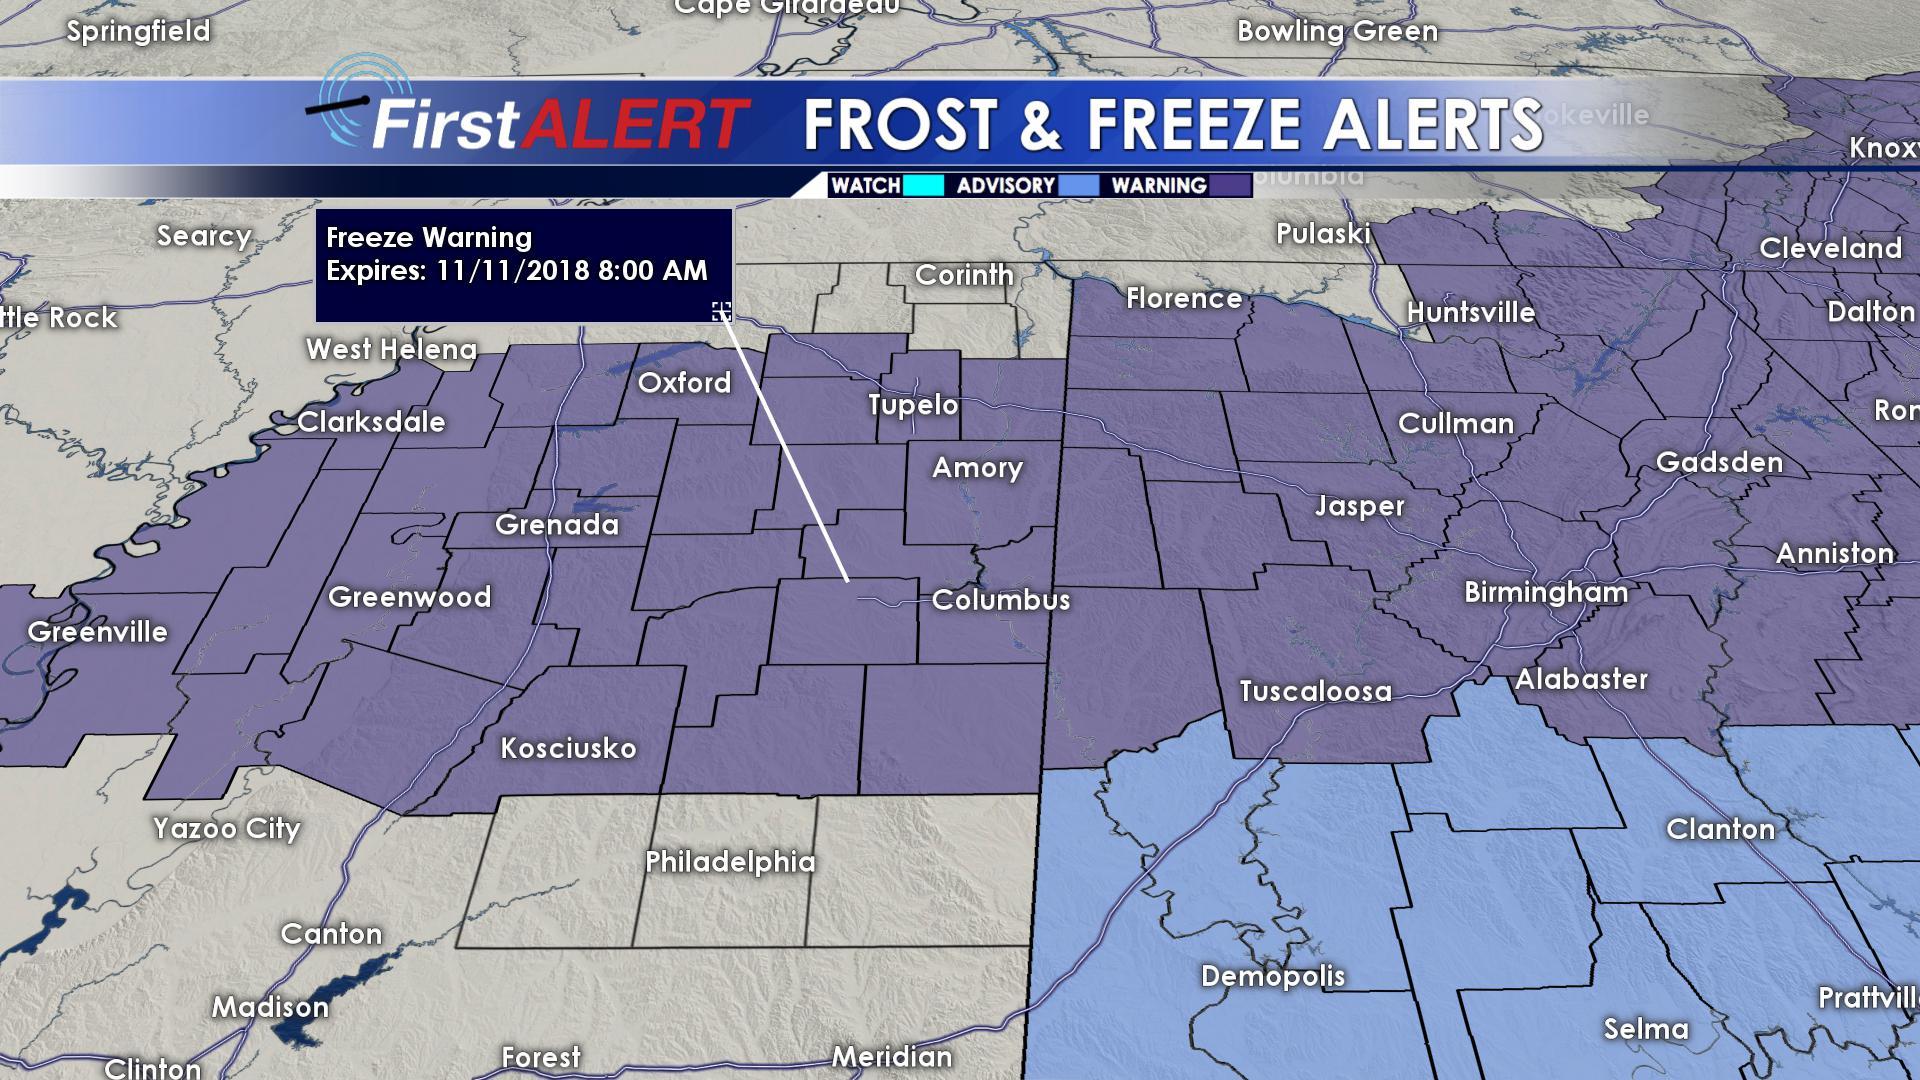 Freeze Warning until 8 AM (11/11)